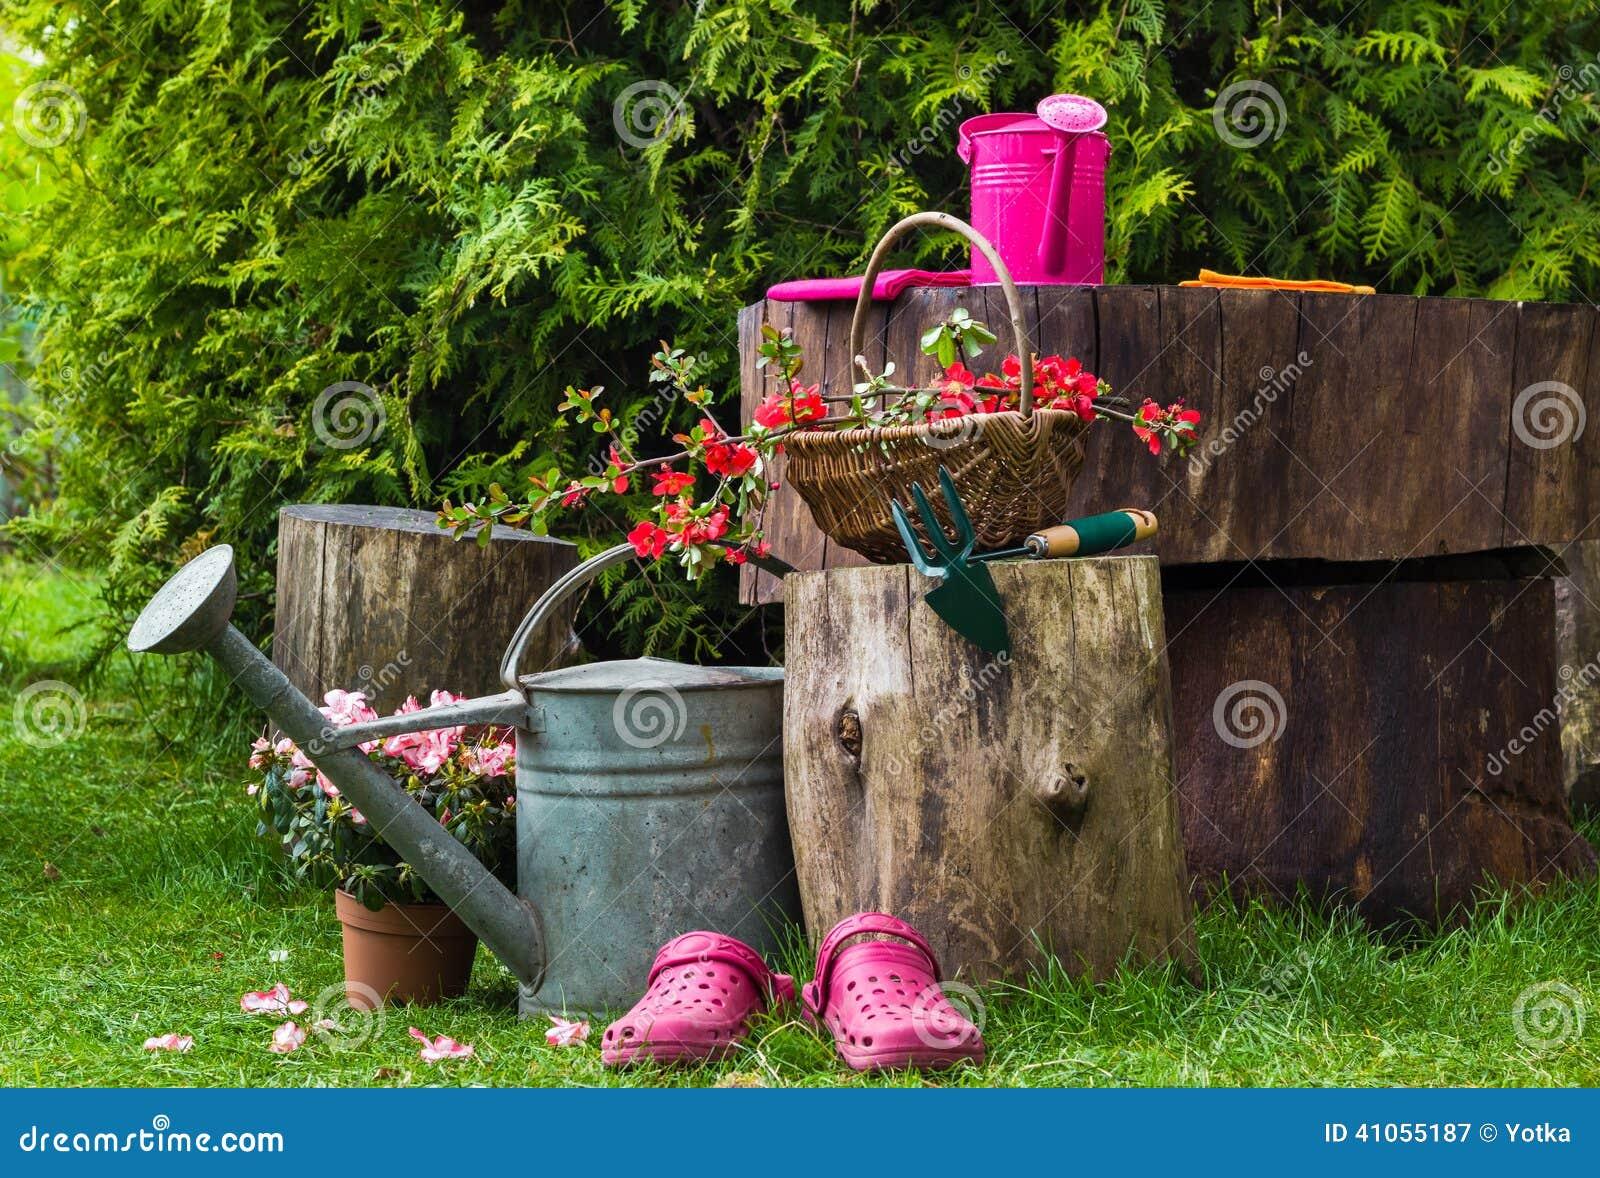 Jardinage d 39 ustensiles d 39 outils de jardin de ressort photo stock image 41055187 - Ratelier outils de jardin ...